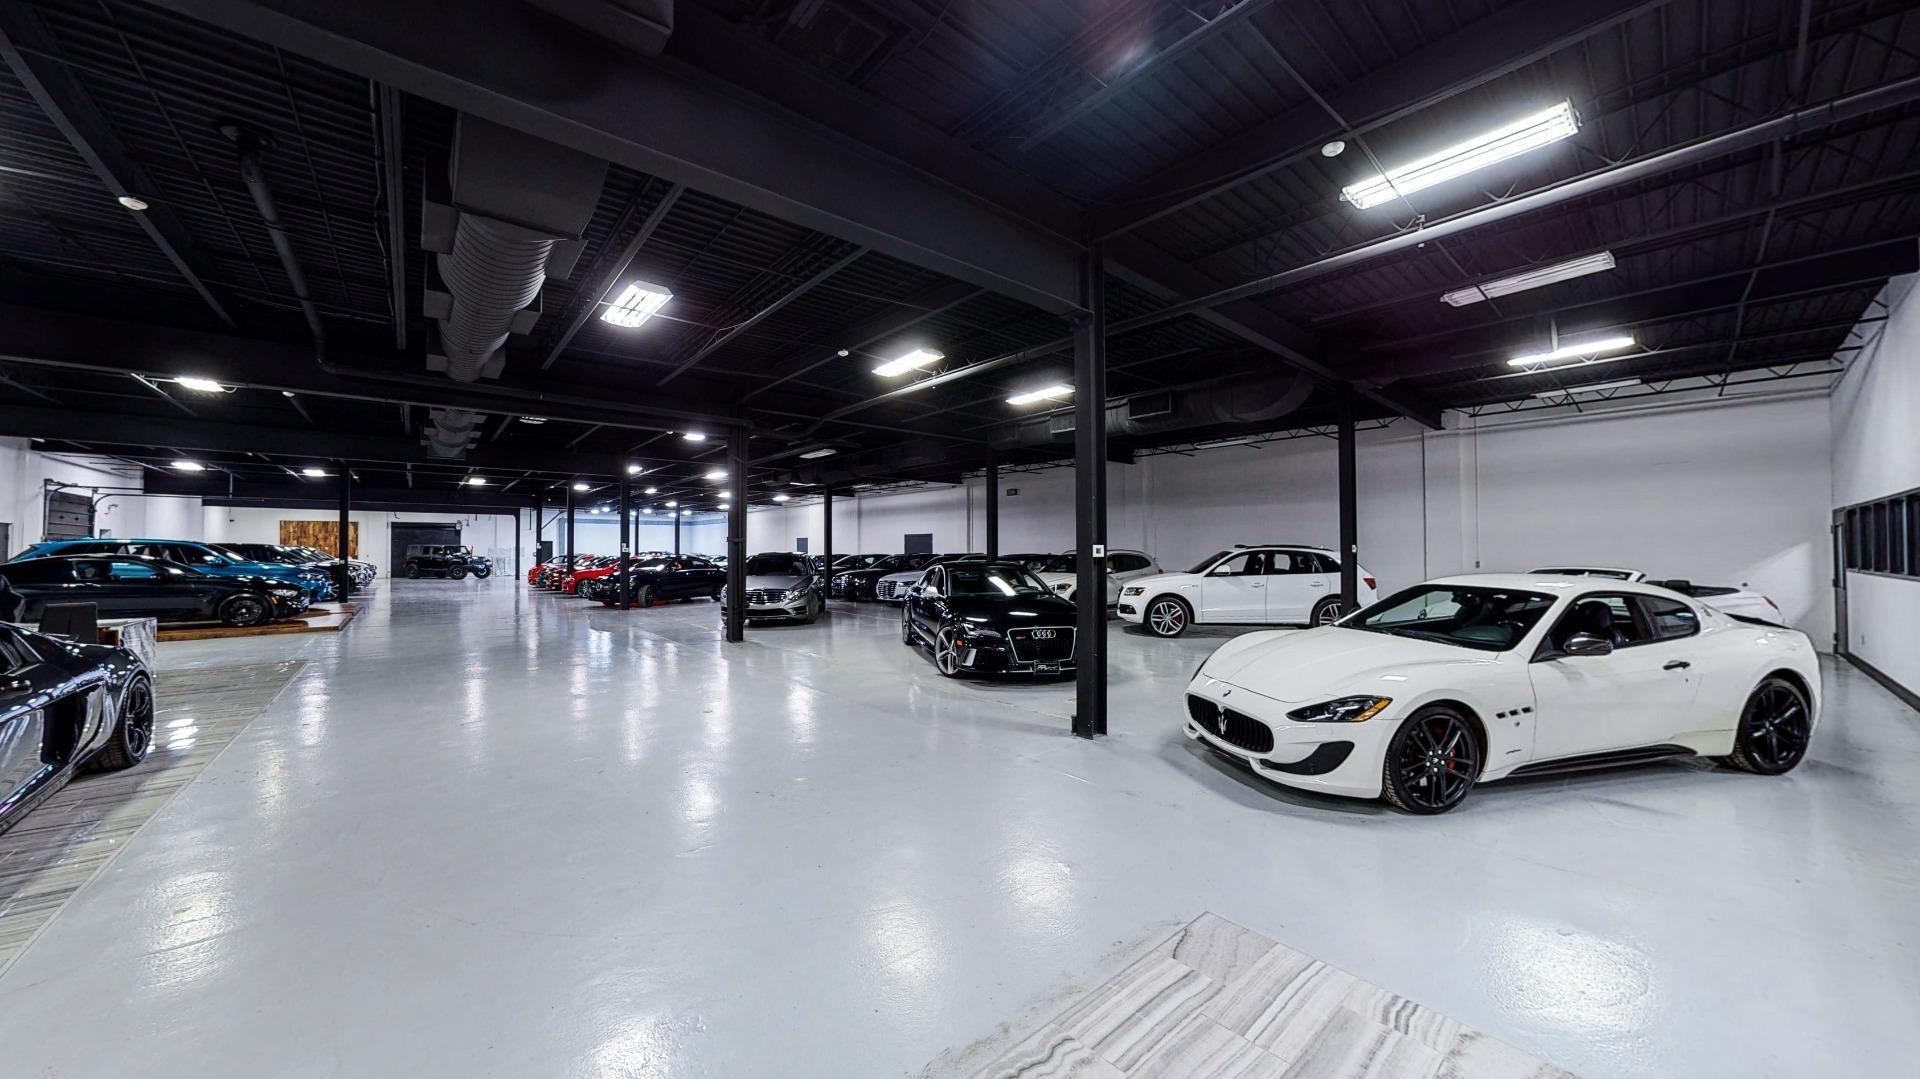 Used 2010 Maserati GranTurismo for sale $38,495 at Perfect Auto Collection in Akron OH 44310 2